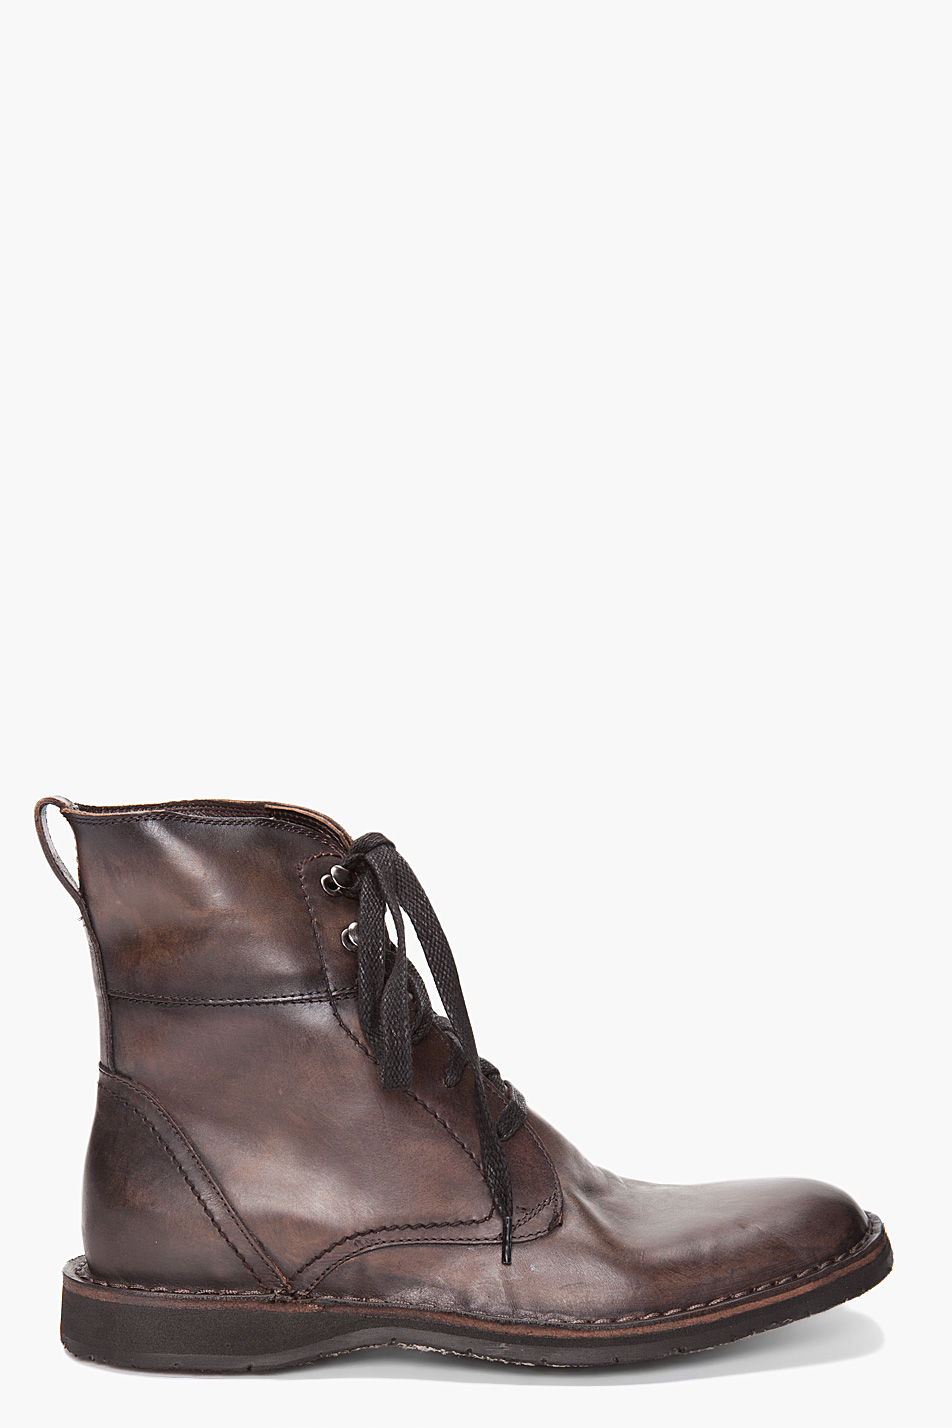 lyst john varvatos winter hipster boots in gray for men